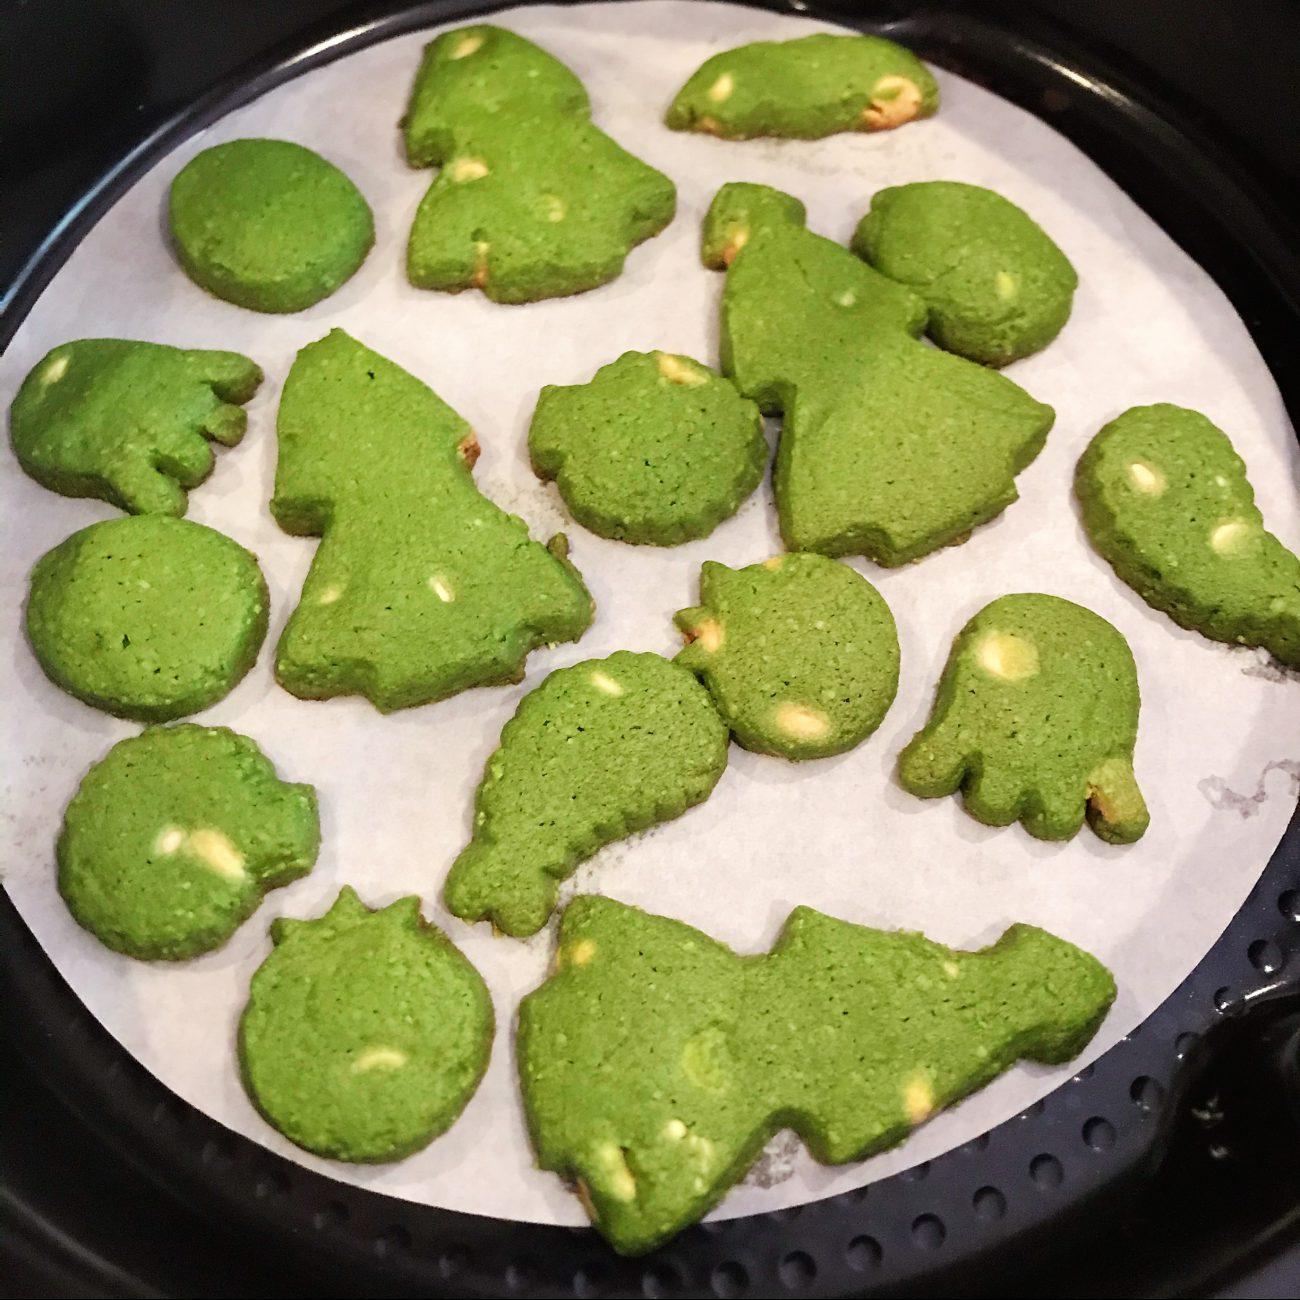 Matcha (Green Tea) cookies